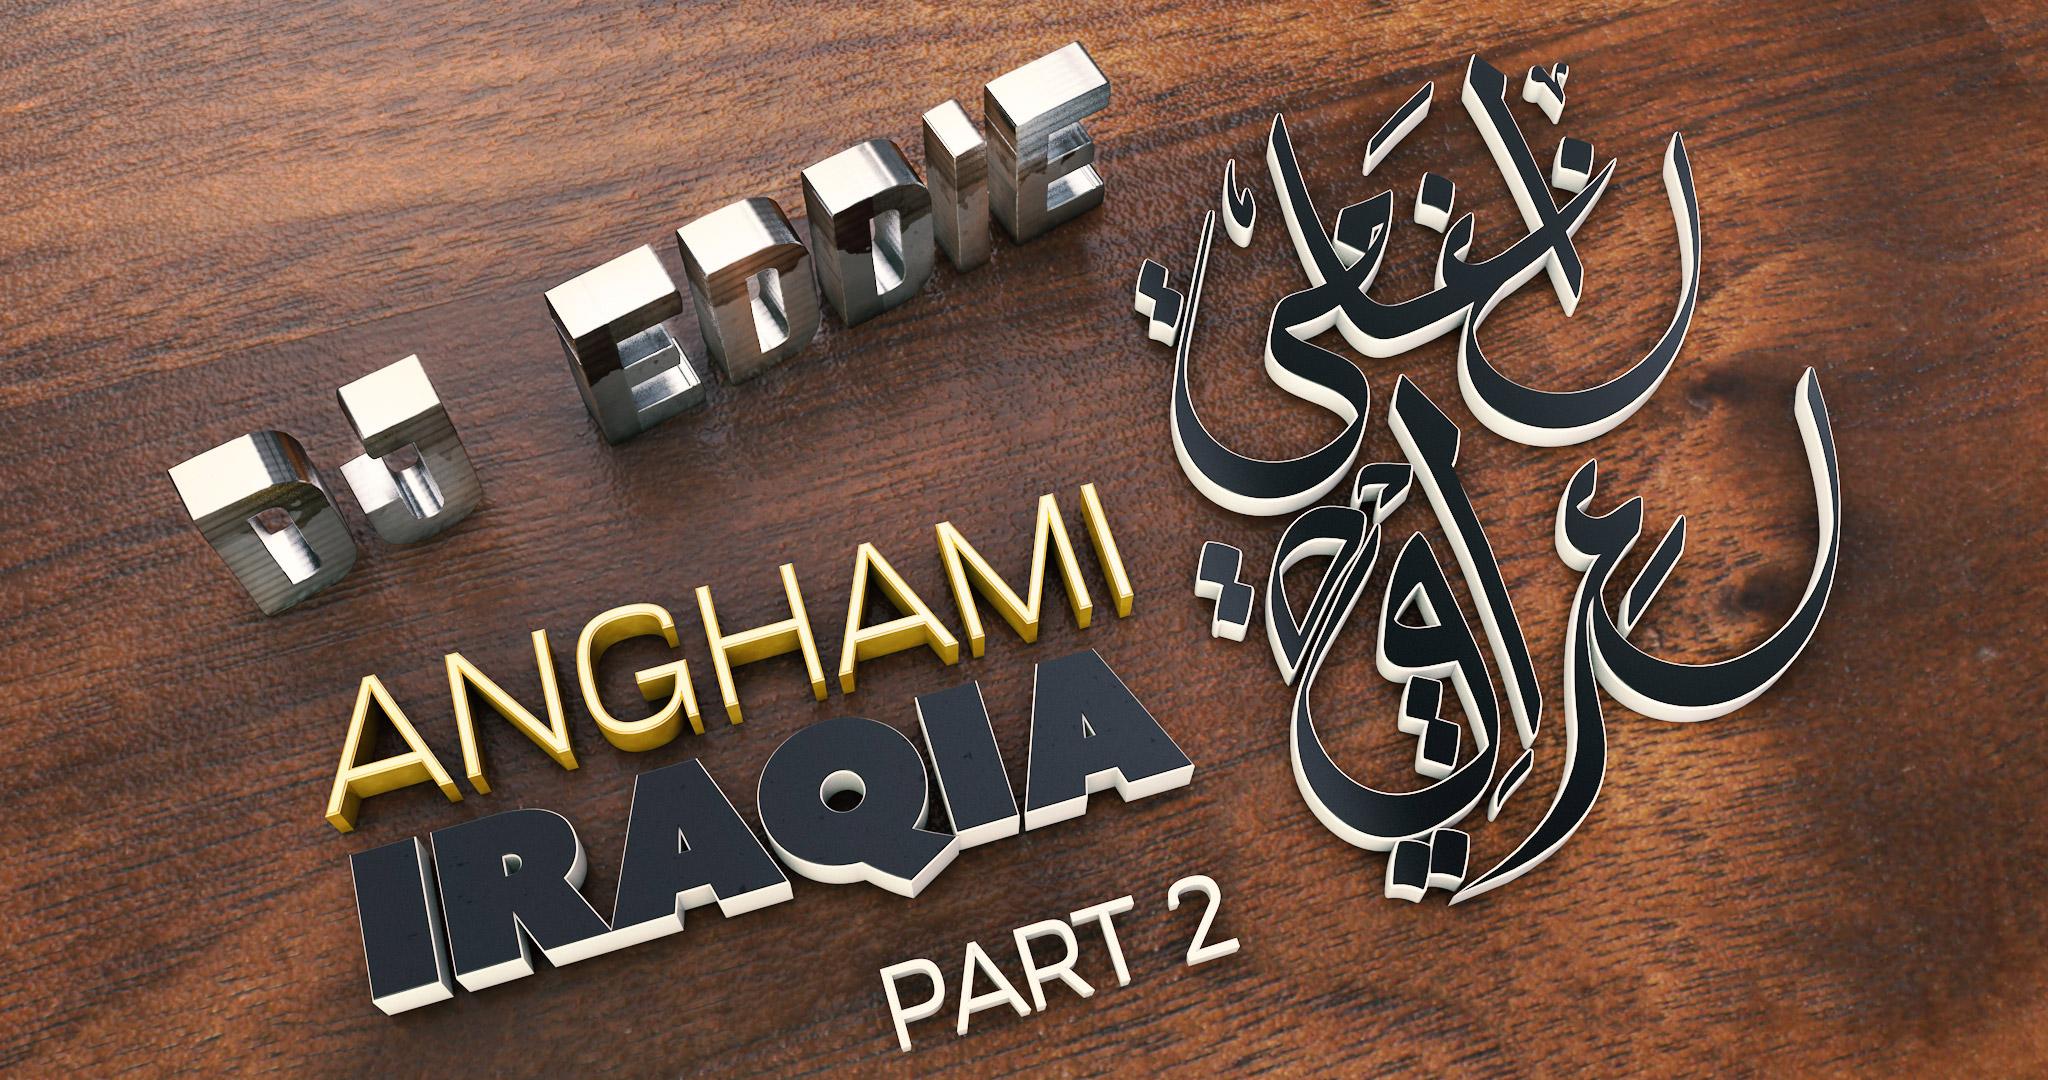 DJ Eddie - Anghami Iraqi Part 2 (Iraqi Live Mix)انغامي عراقية ٢ لايف مكس